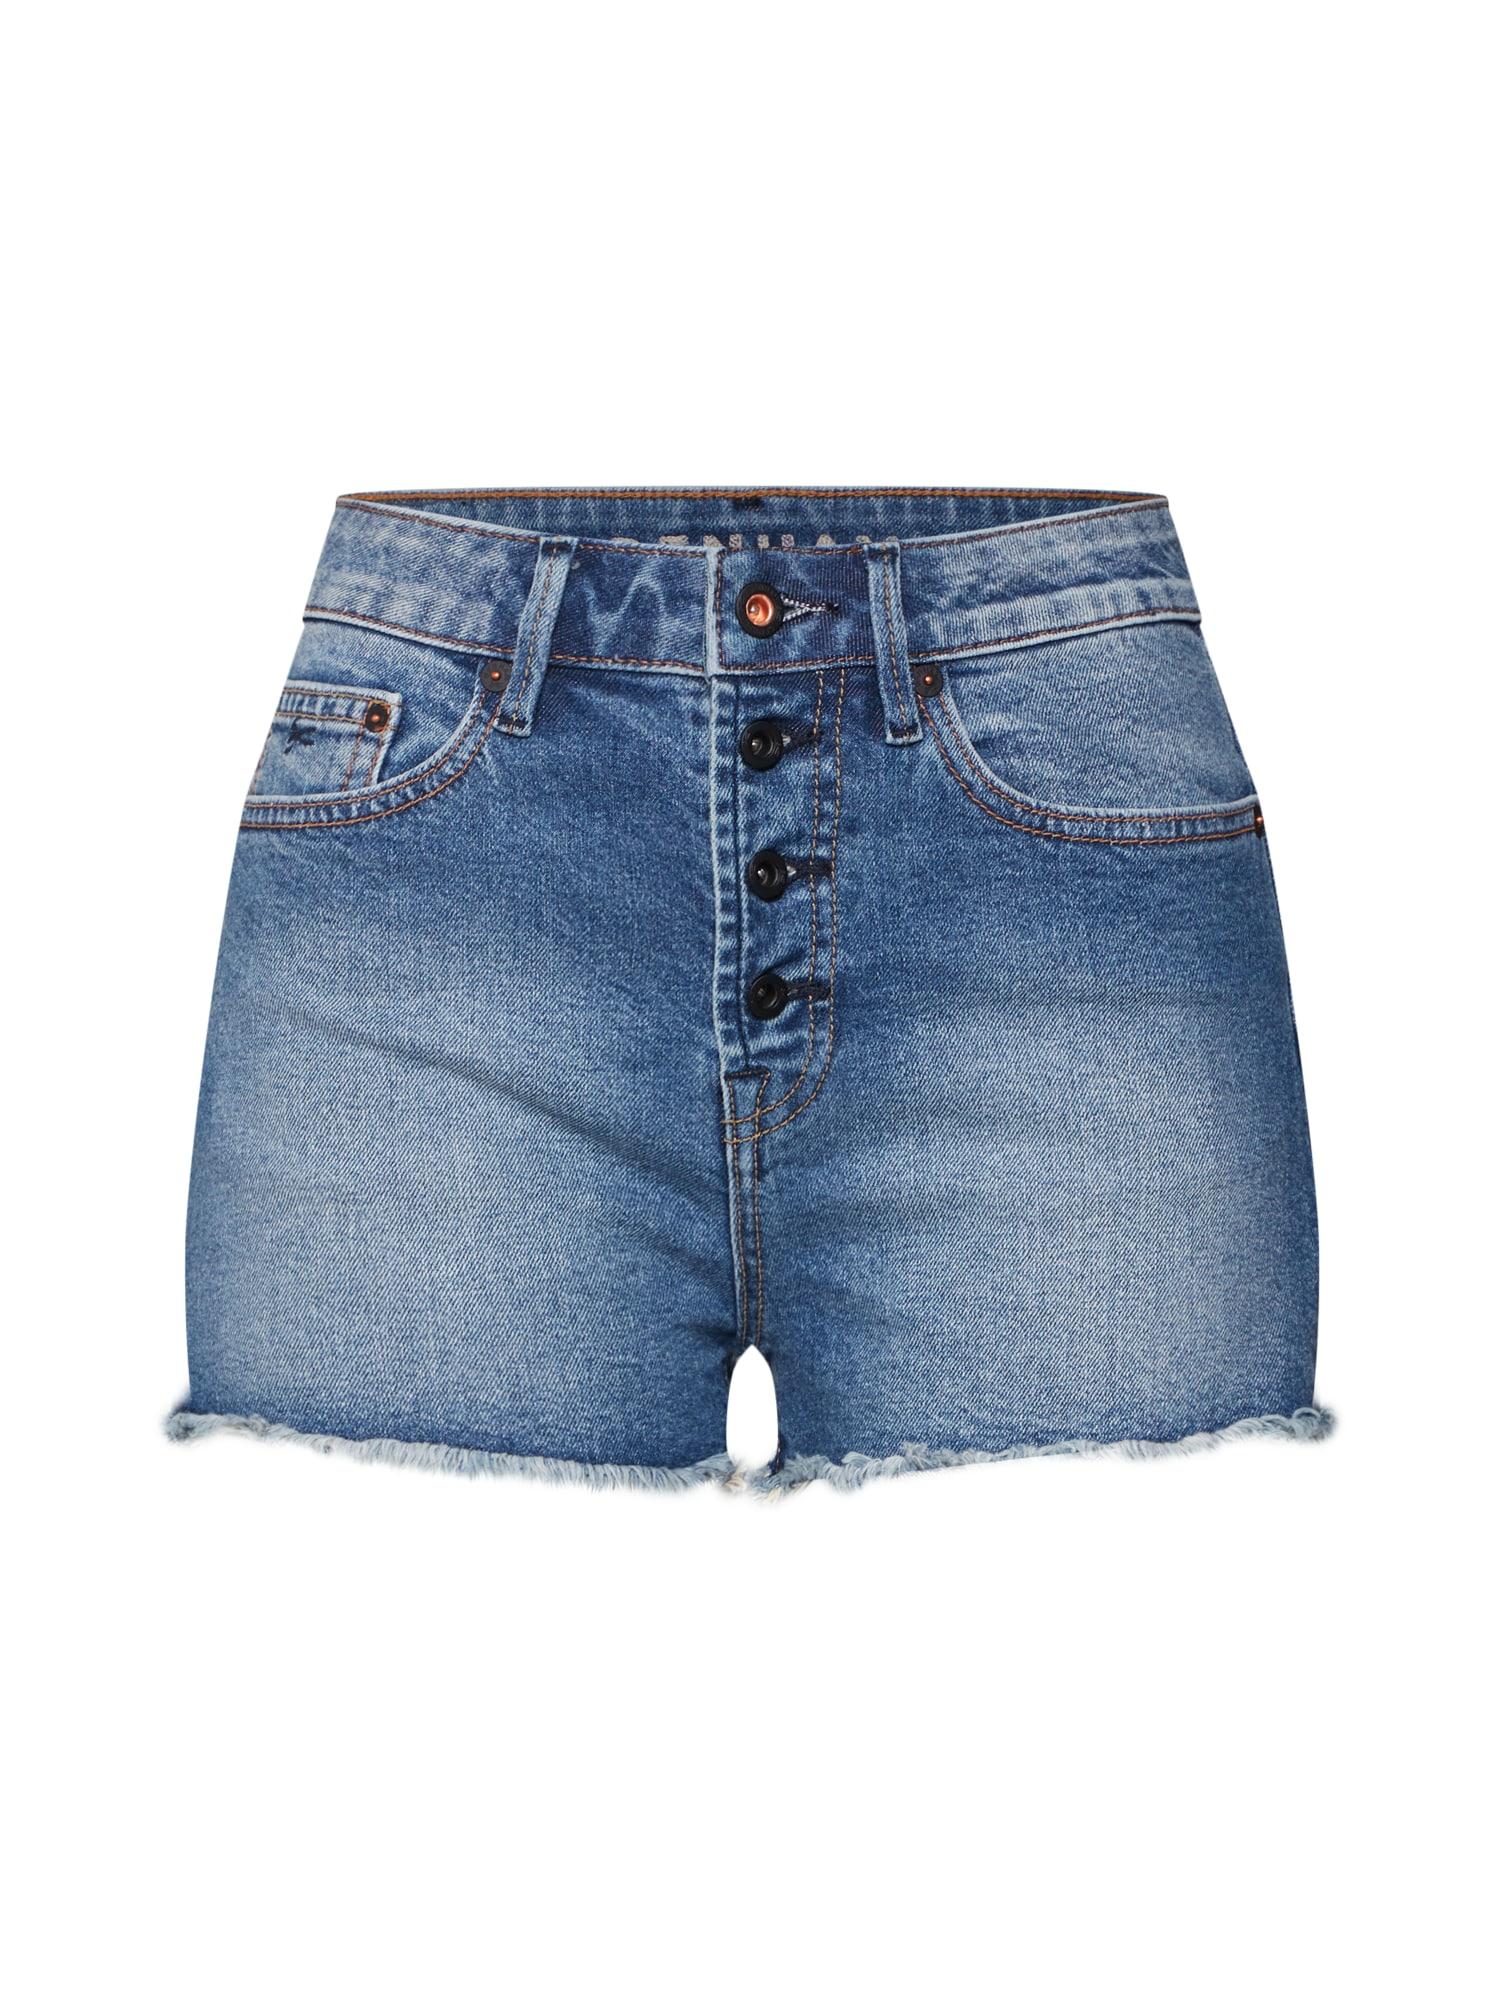 Jeansshorts 'HEIDI' | Bekleidung > Jeans > Shorts & Bermudas | Denham